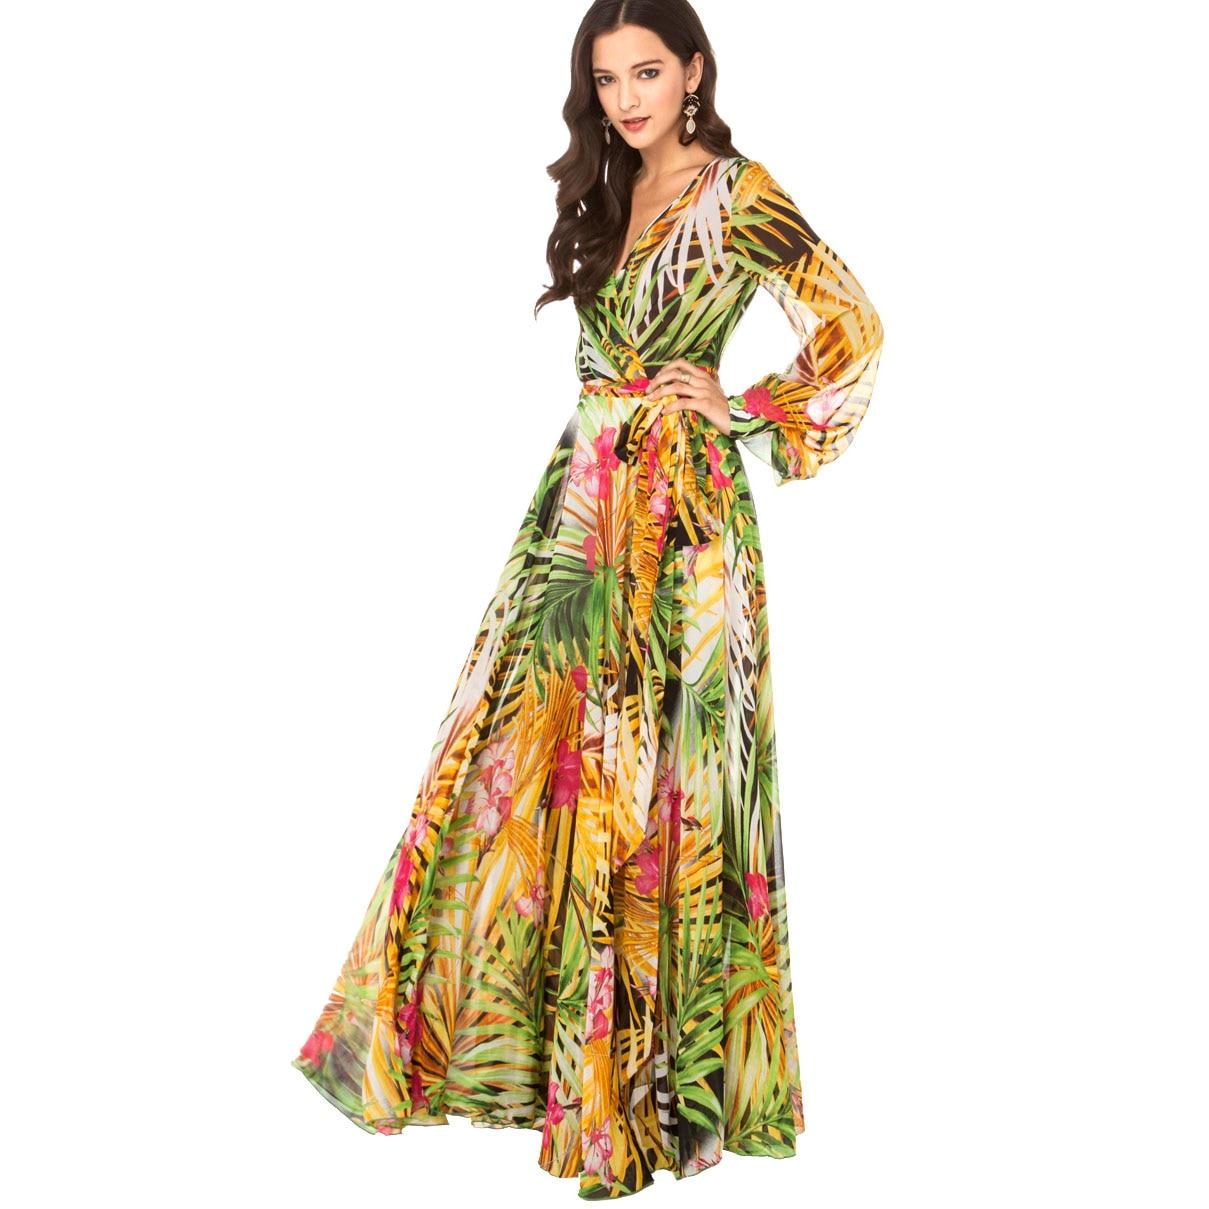 b900dd169b88 XS-XXL New fashion Summer tropical flower print chiffon long sleeve length  elegant one-piece dress  HT093